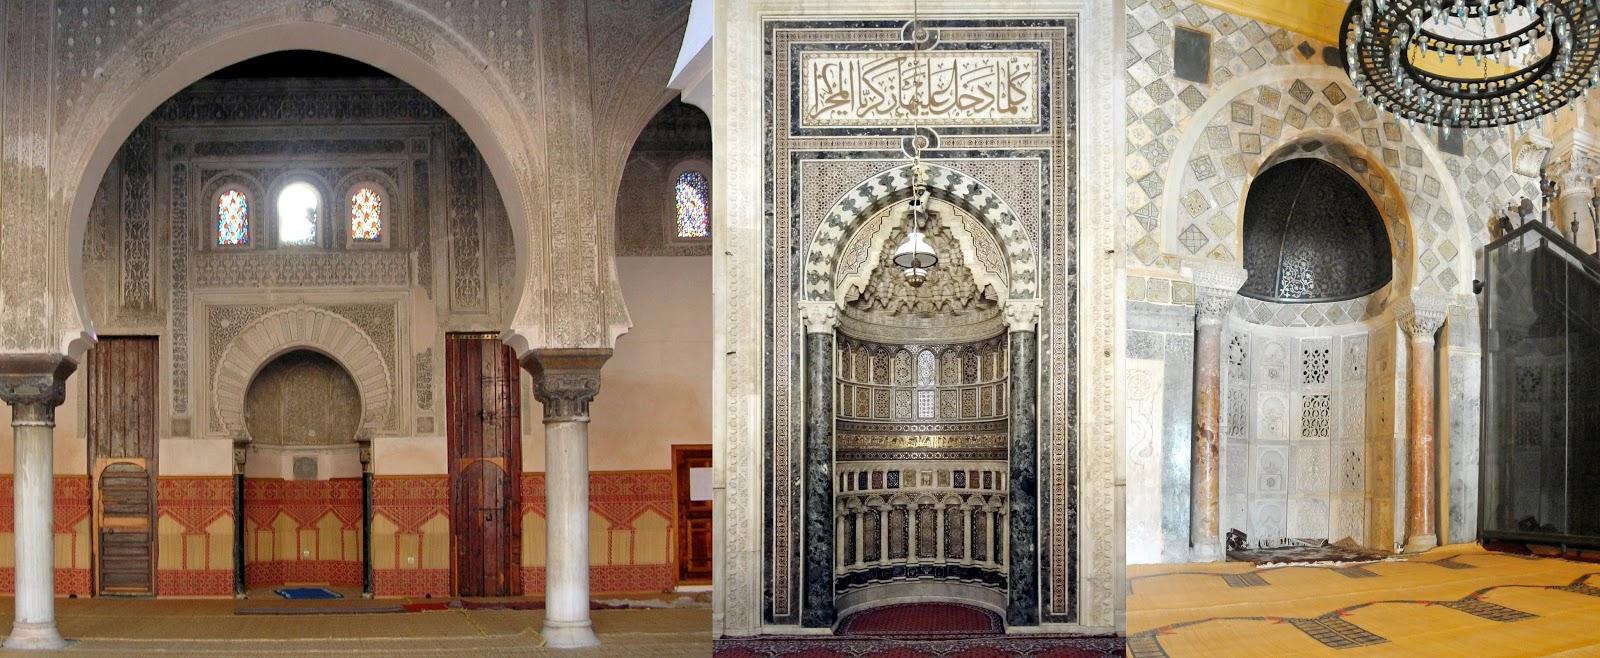 Great Mosque Kairouan Mihrab Great Mosque of Kairouan